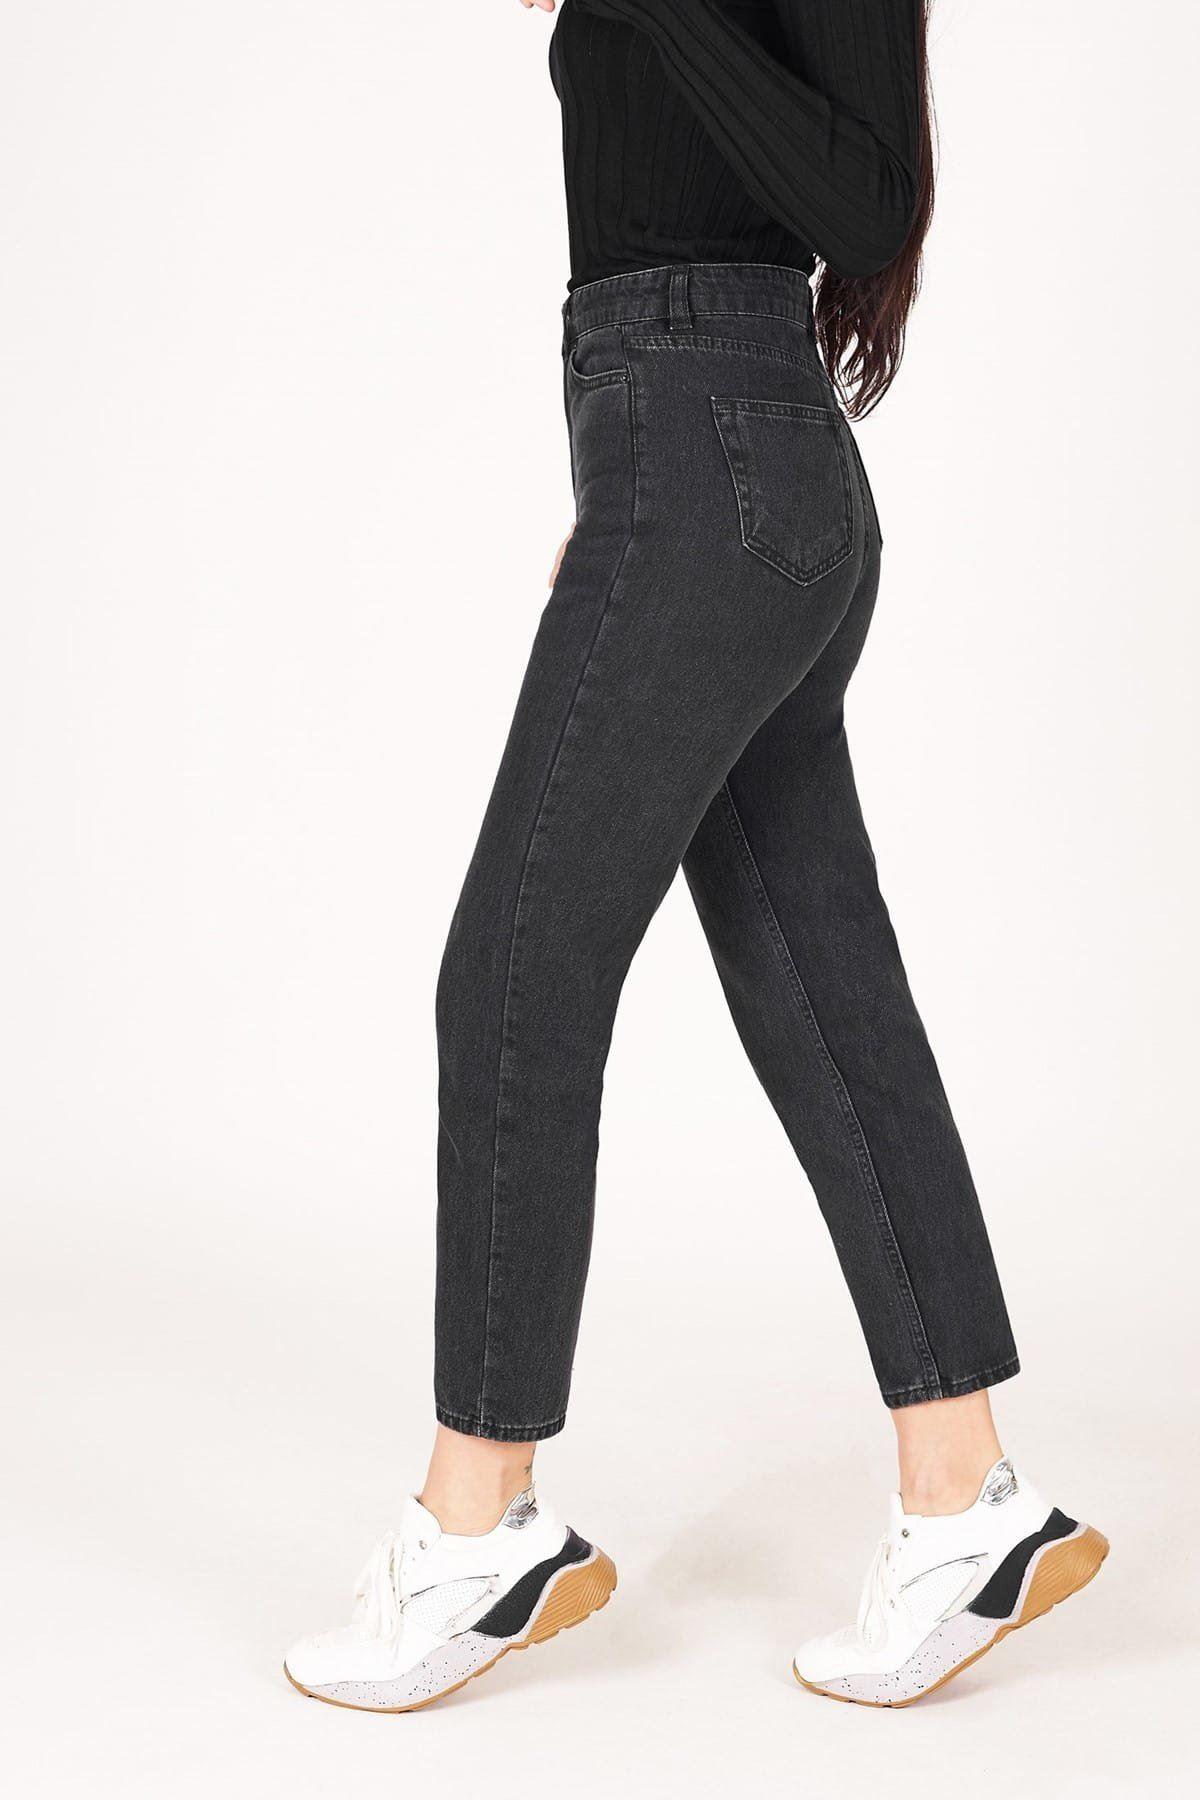 Füme Mom Jeans